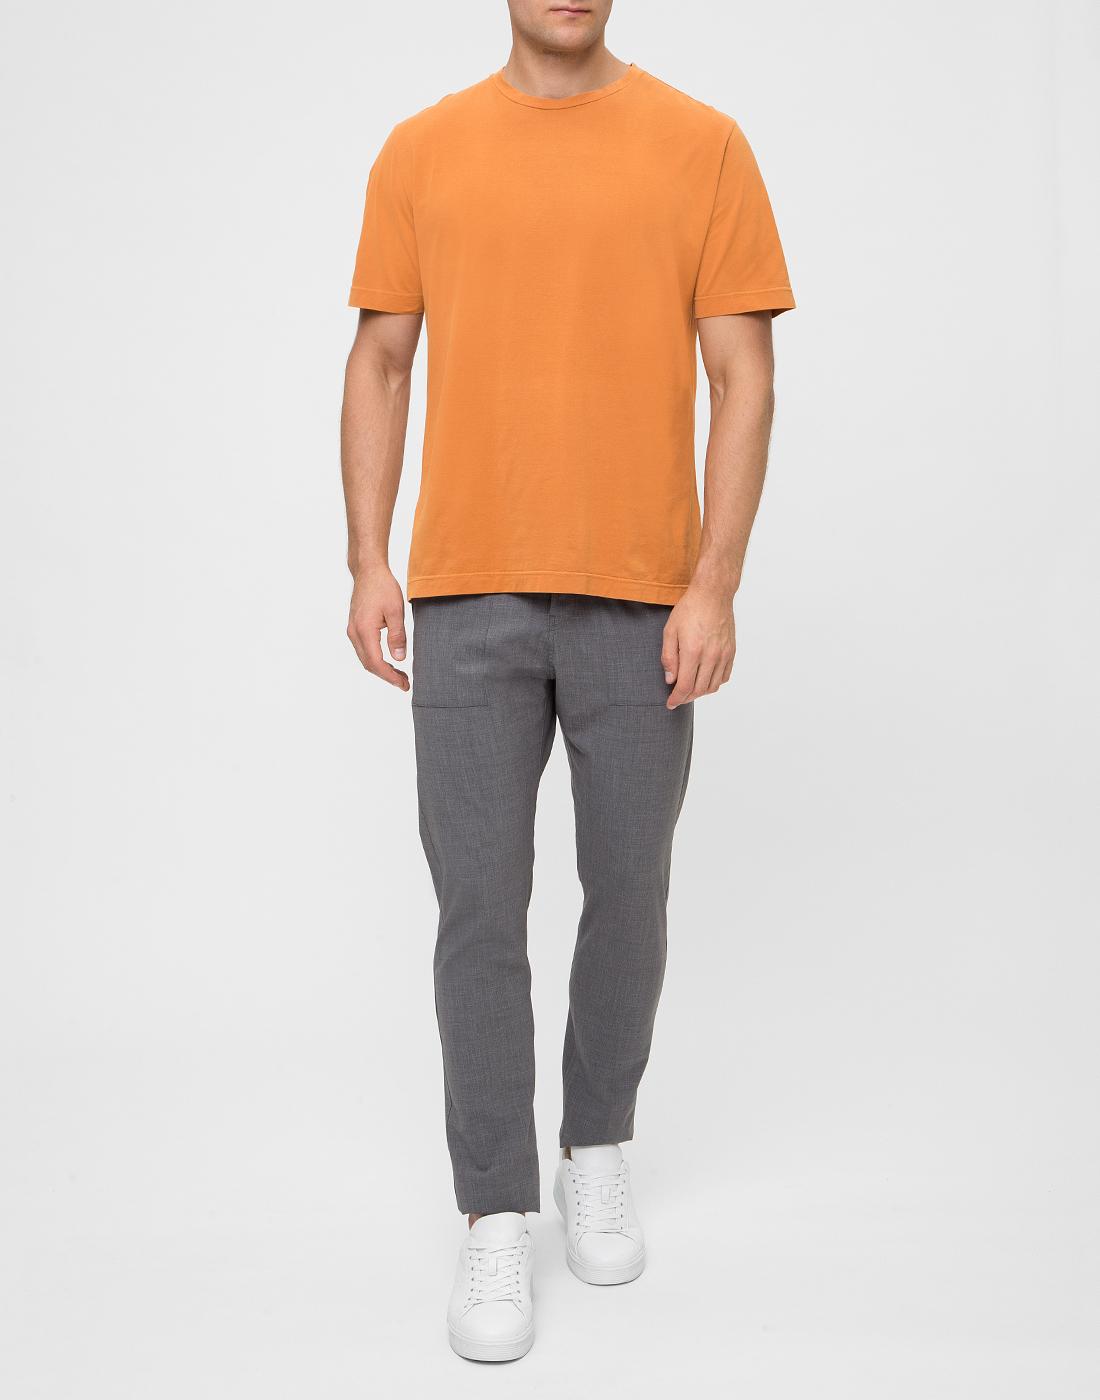 Мужская оранжевая футболка Capobianco S4M660.AL01 ARANCIONE-5